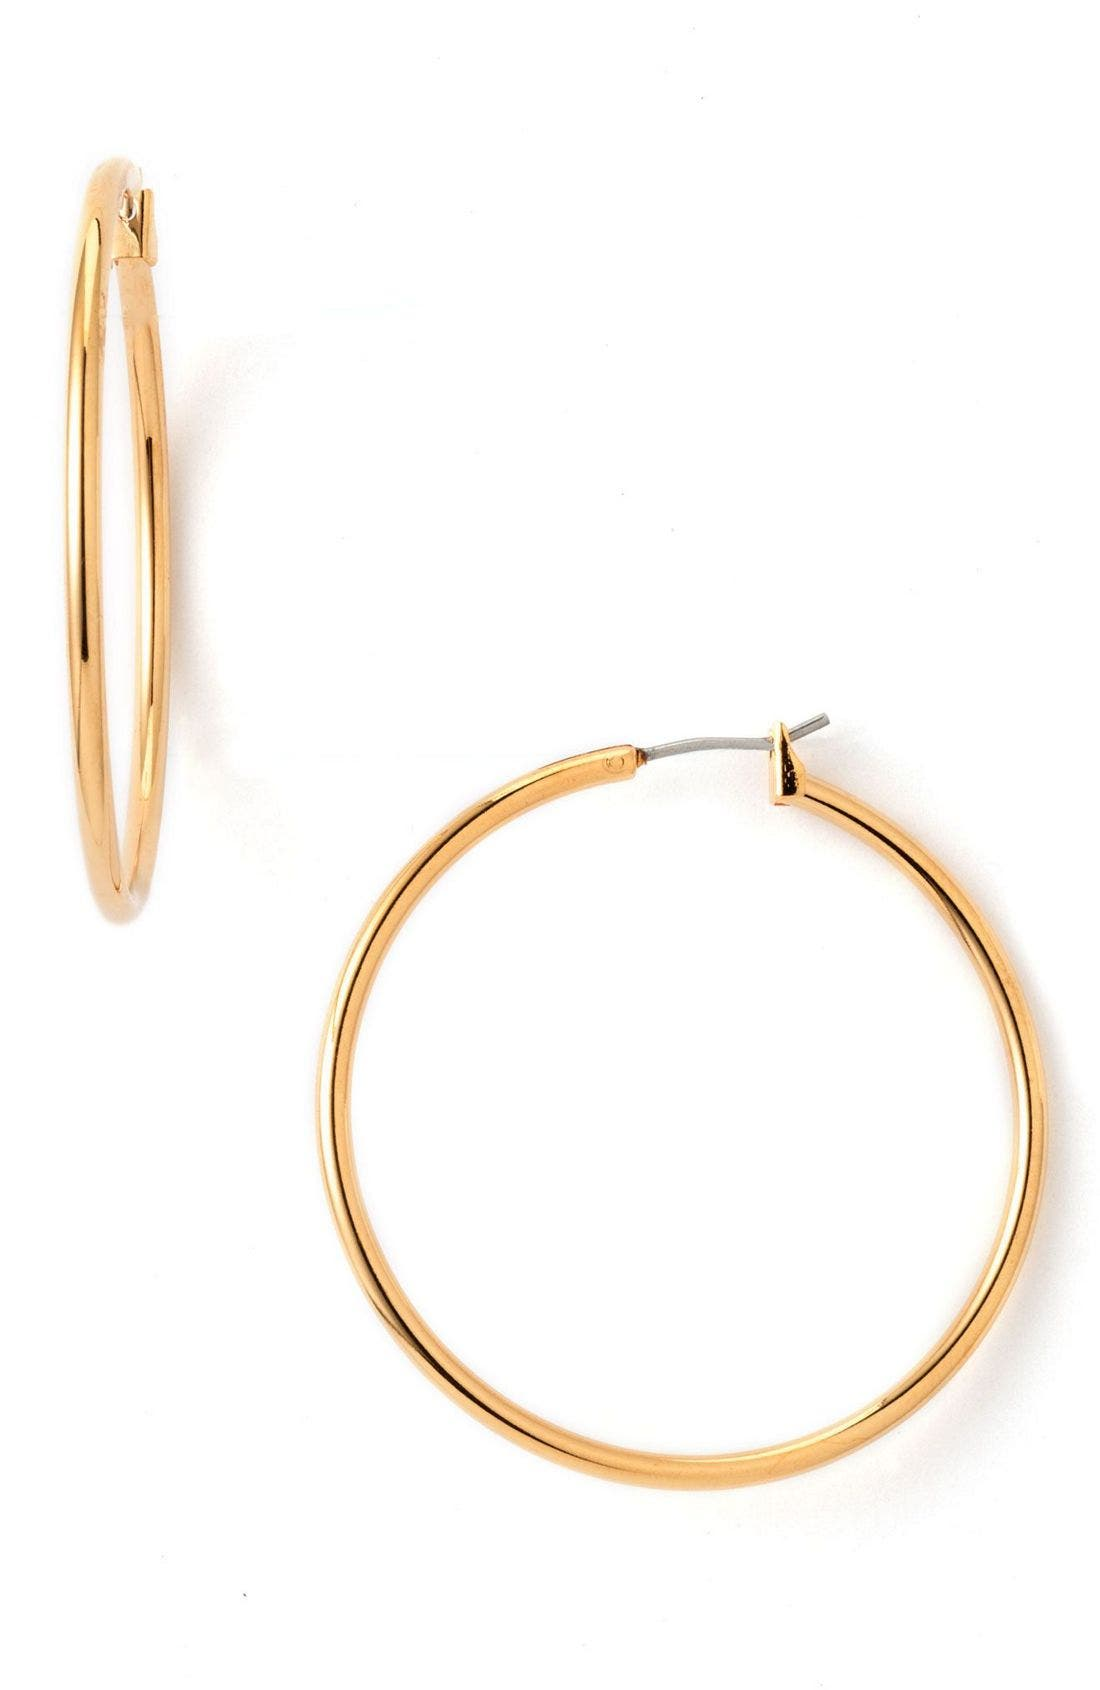 Main Image - Nordstrom Classic Hoop Earrings (Nordstrom Exclusive)